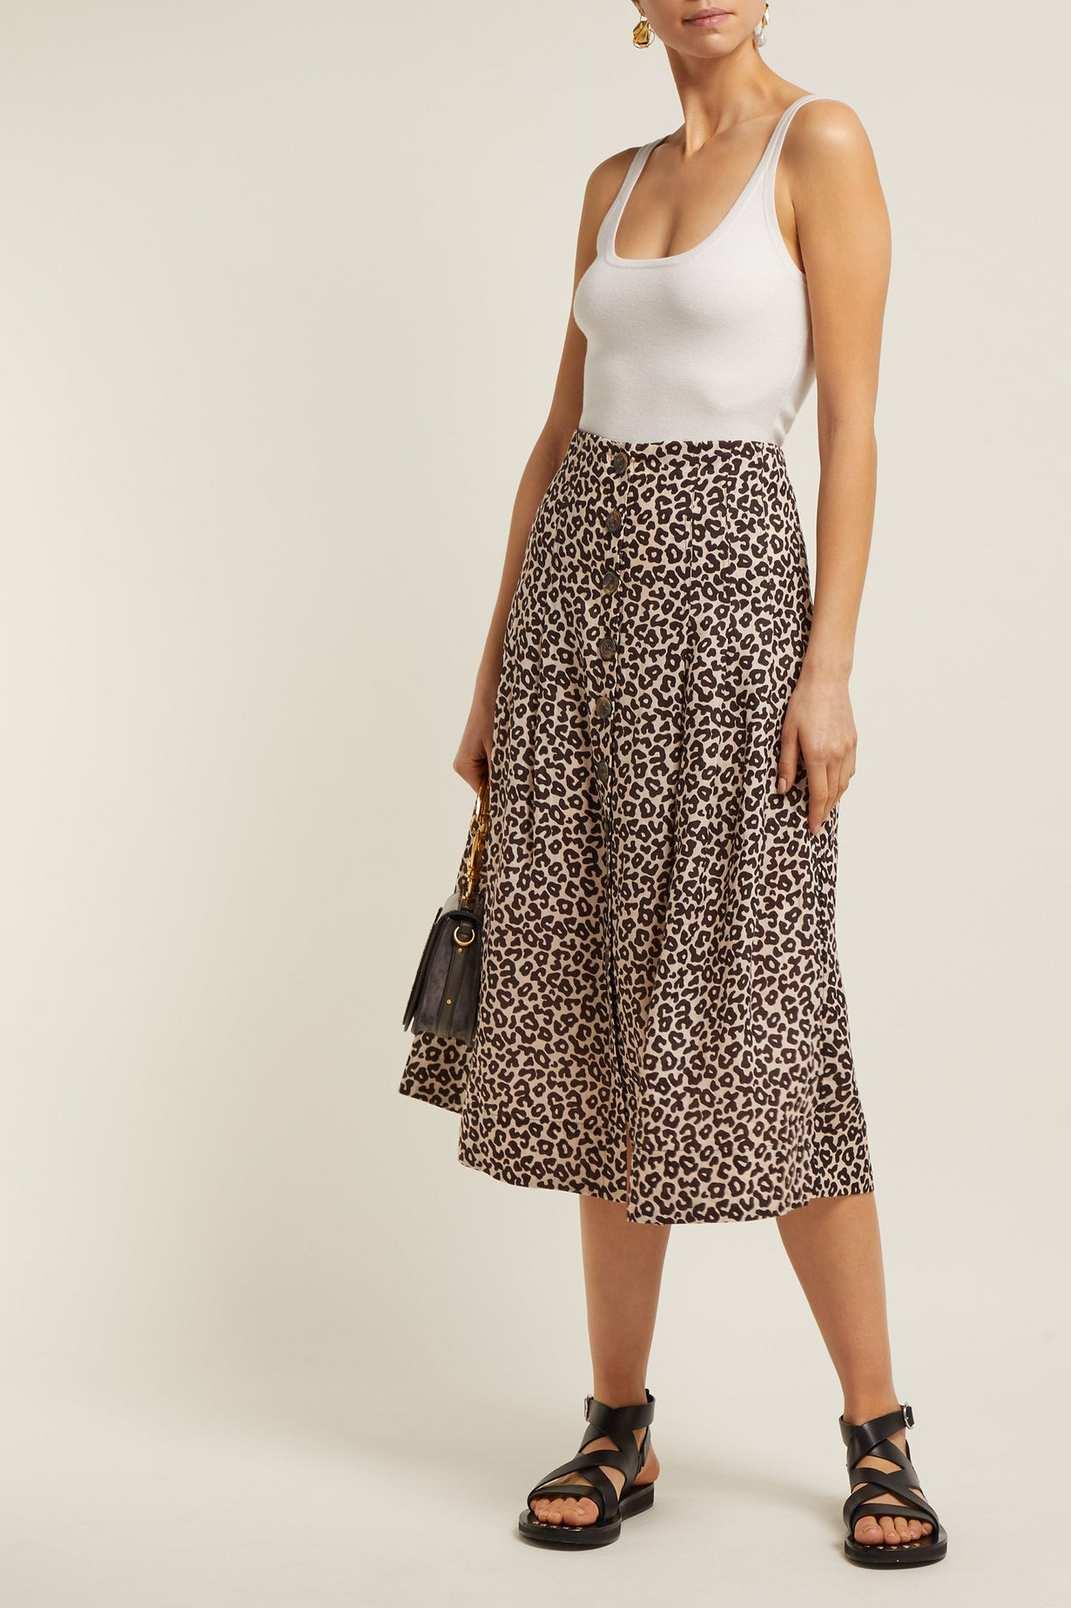 Sea Lottie Leopard Print Button Skirt